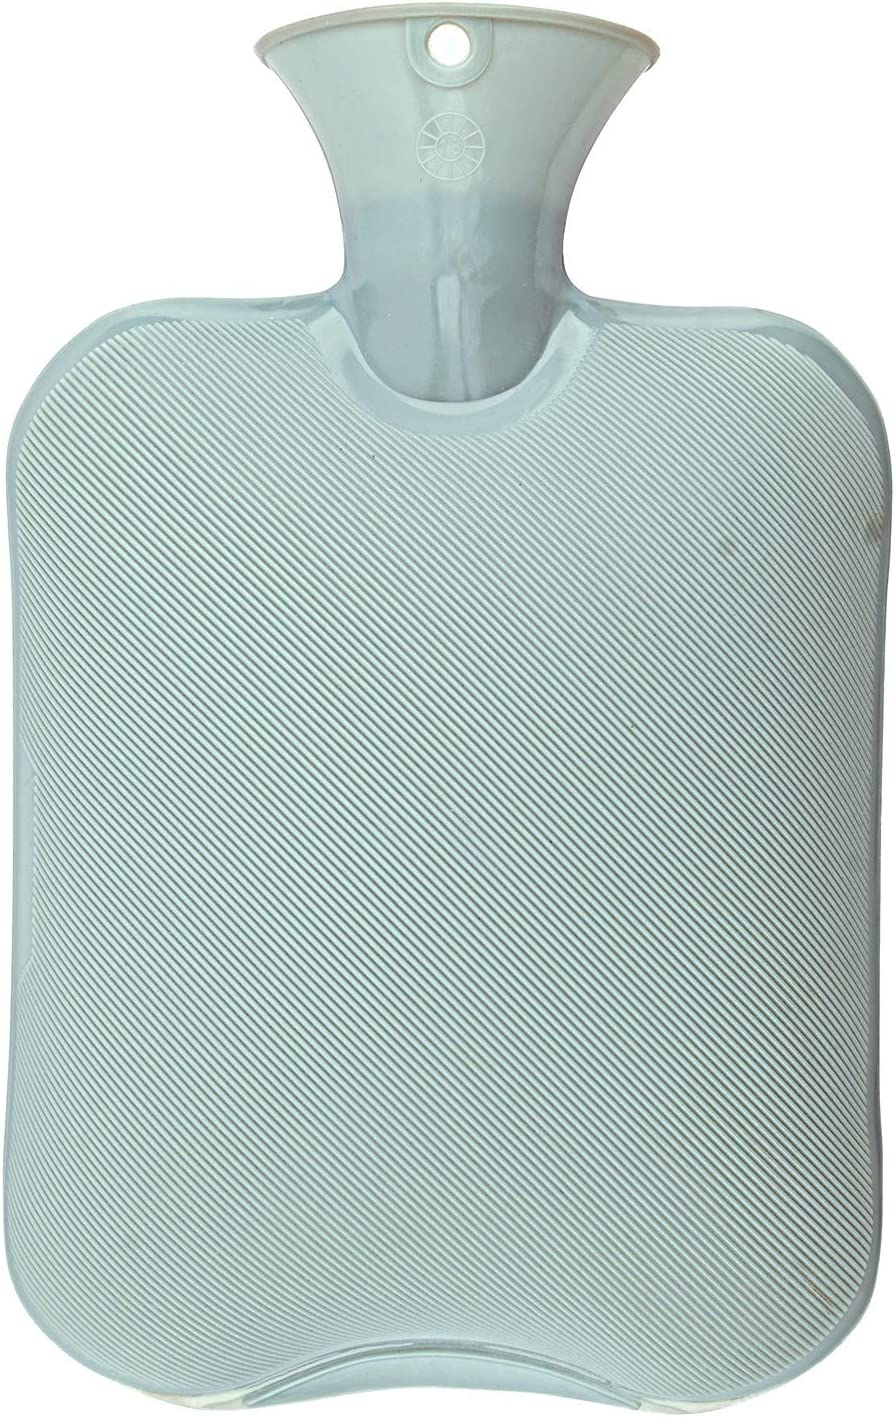 MKPCW Premium Classic Rubber Hot Water Bottle (Blue)